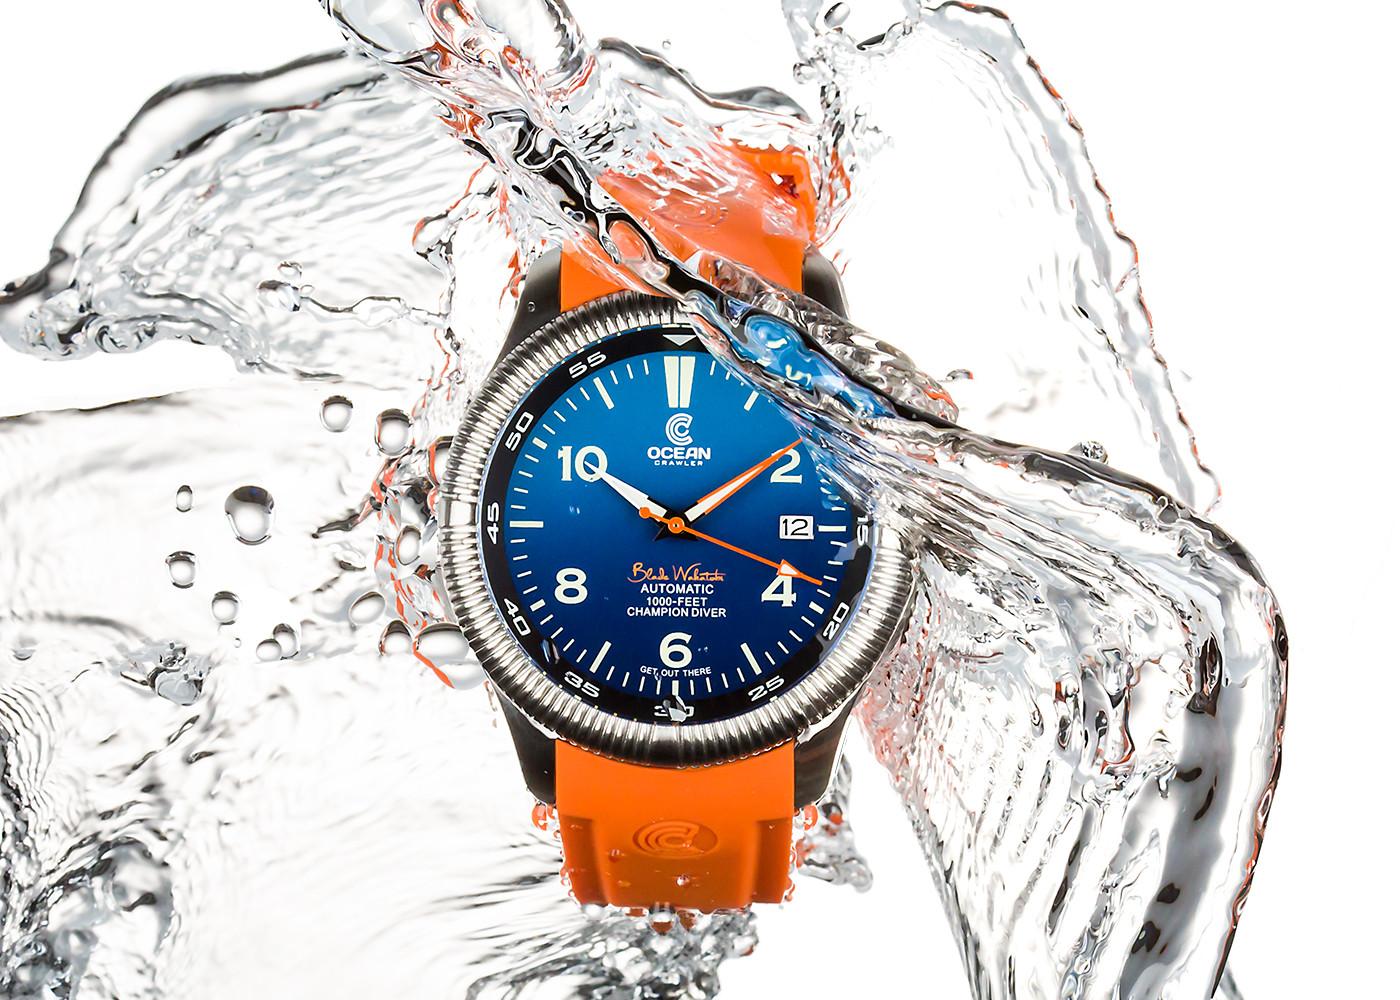 Win An Ocean Crawler Watch